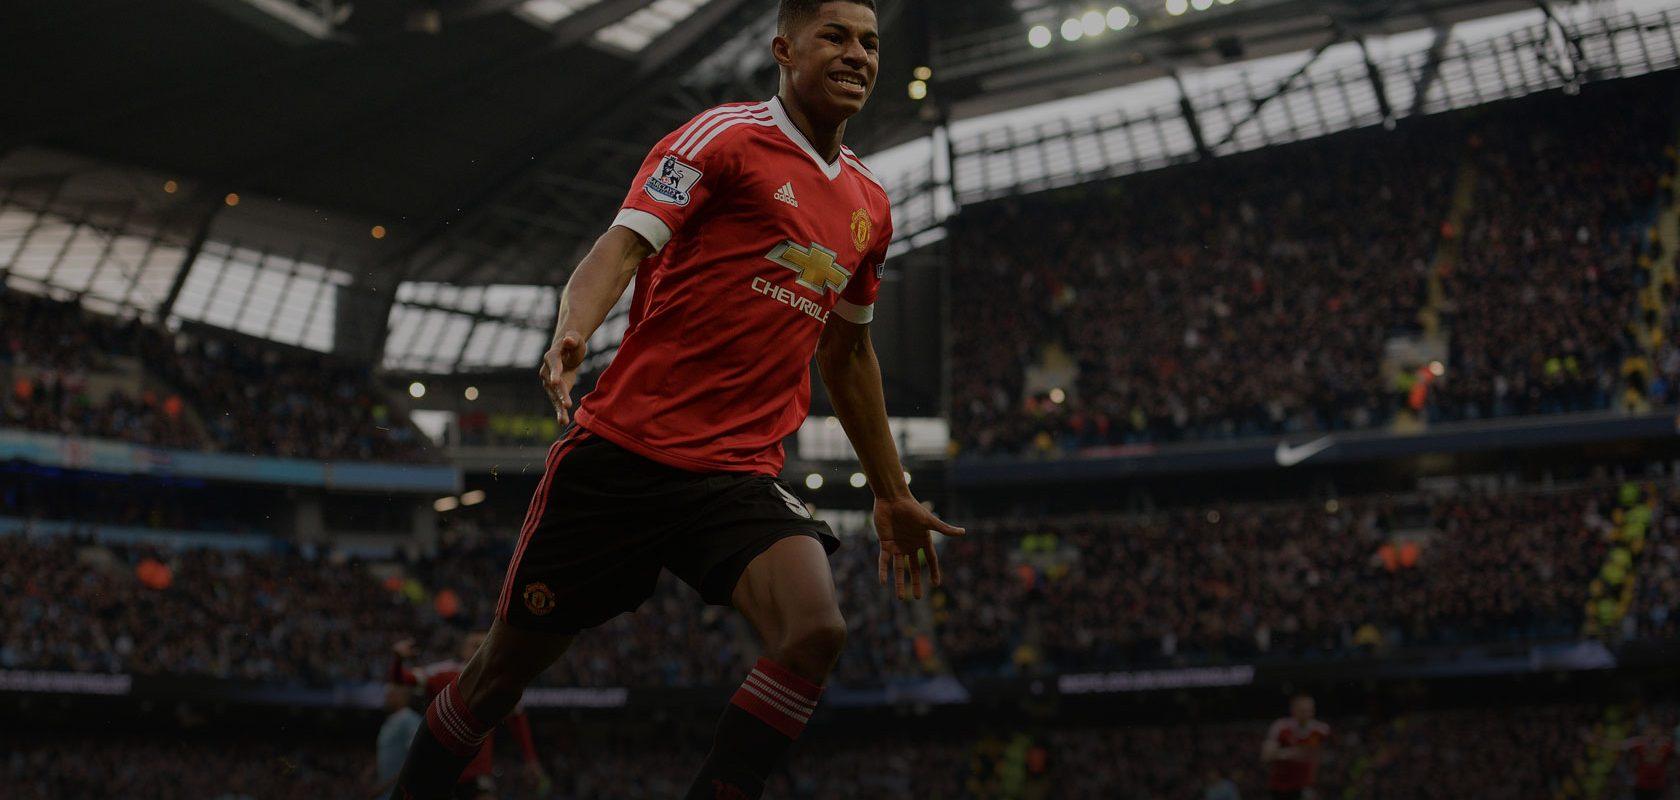 Marcus Rashford for Manchester United. Photo: OLI SCARFF / Stringer